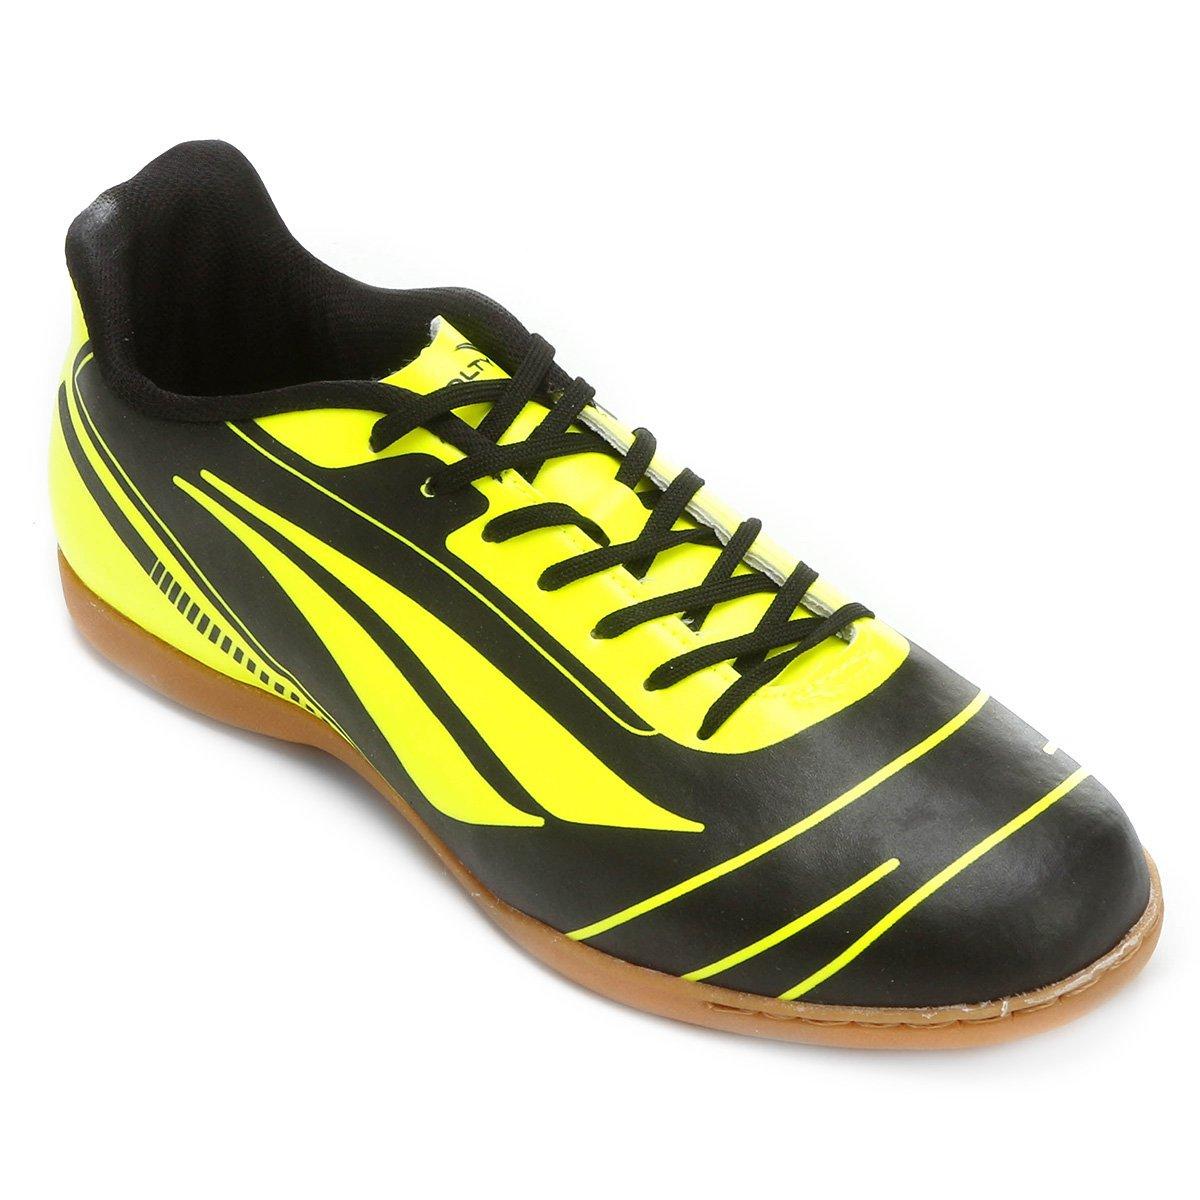 4ca6c9a20f Chuteira Futsal Penalty Era 6 - Edição Limitada Masculina - Compre ...